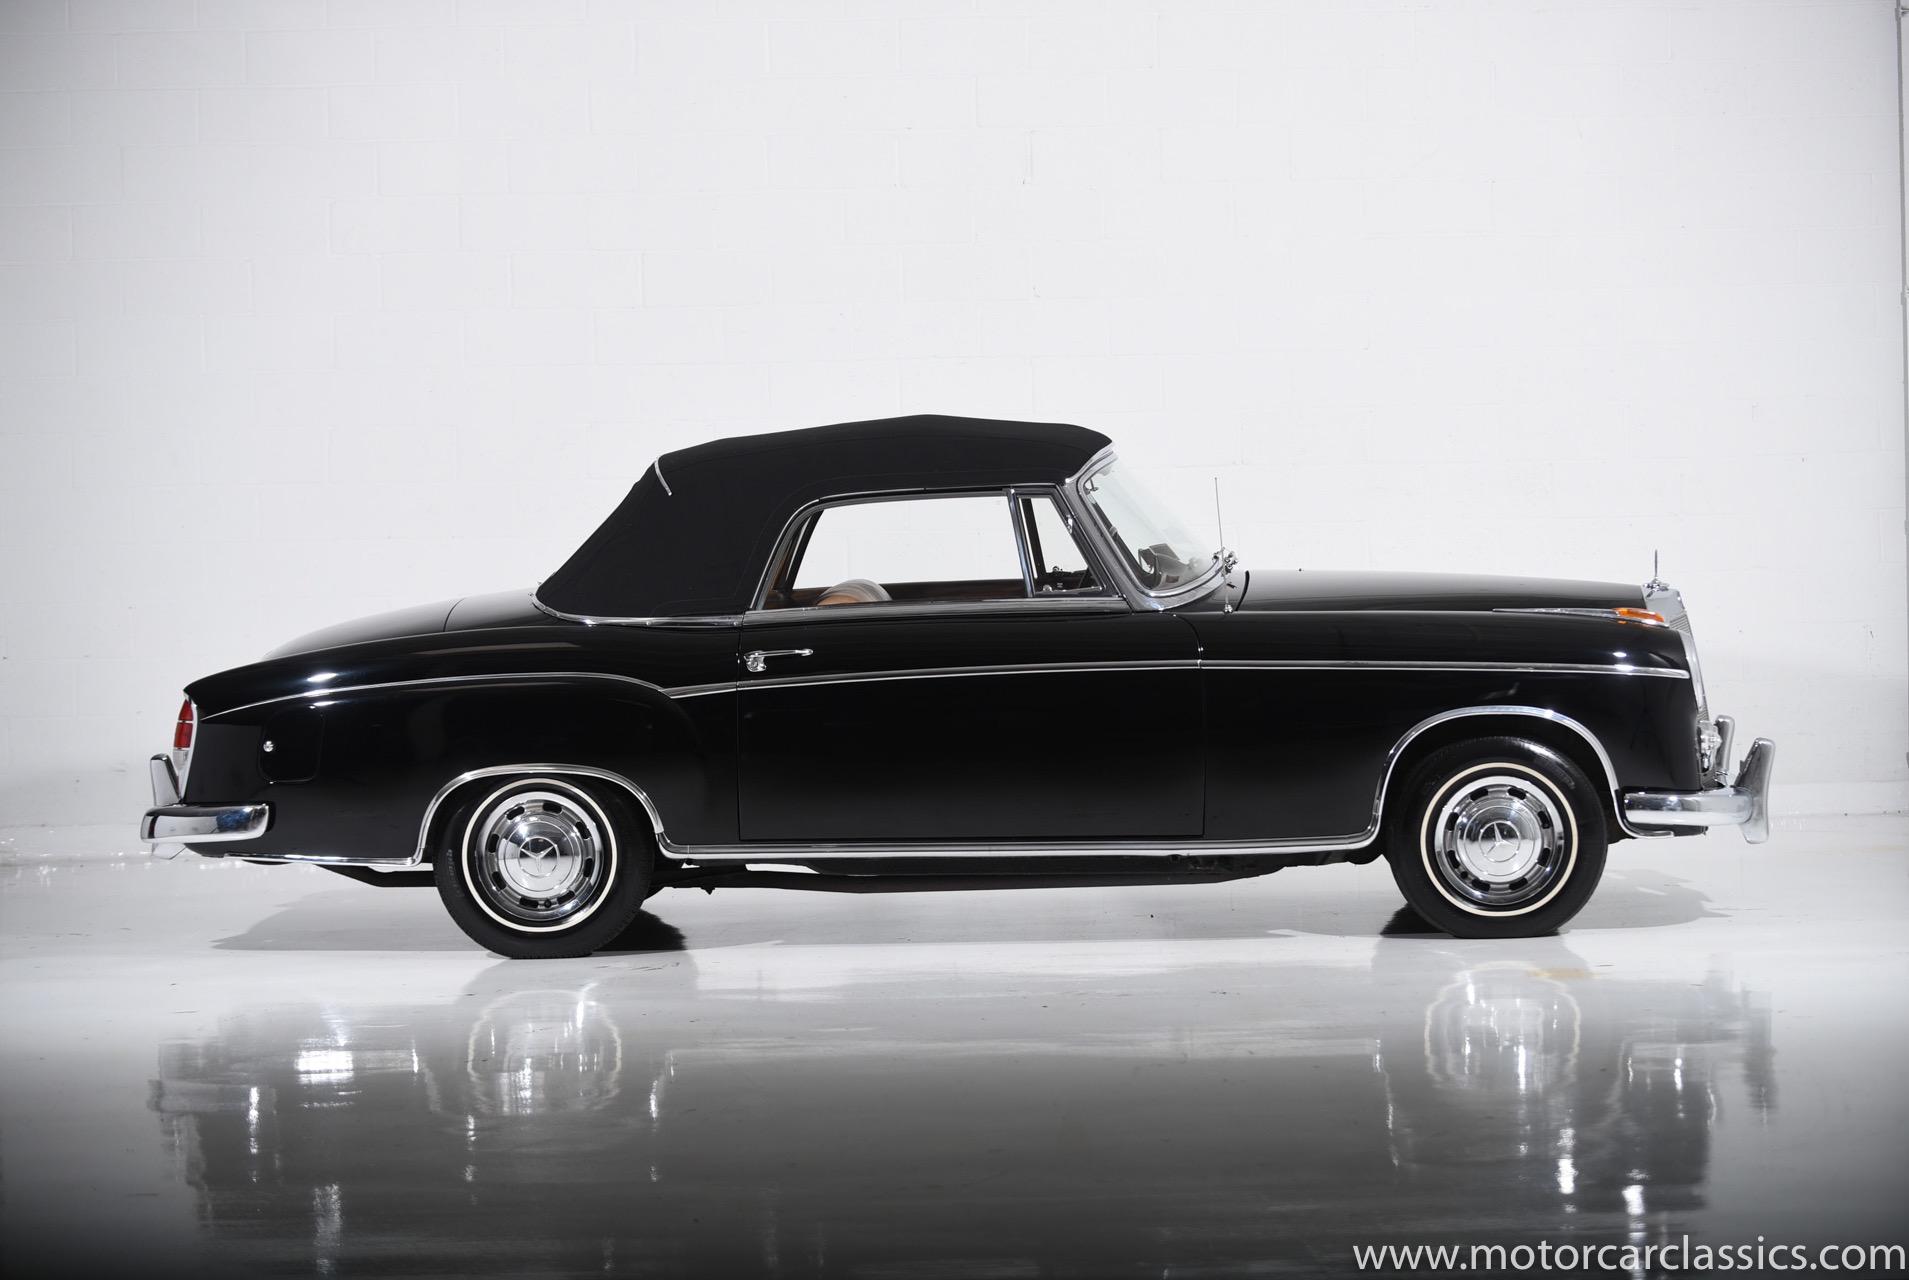 1959 Mercedes-Benz 220 S Cabriolet